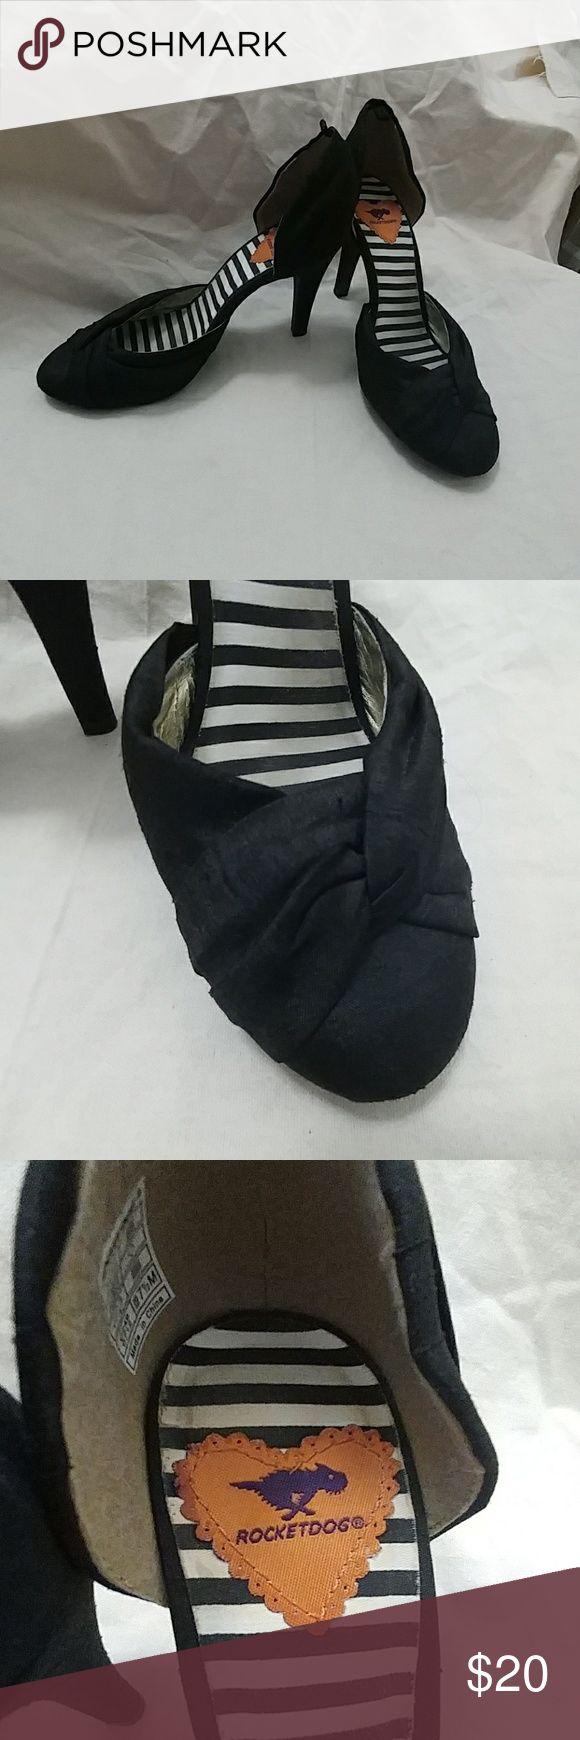 Rocket Dog Black Retro heels Rocket Dog Black Retro heels. Raw satin fabric, size 7.5. Only worn 2-3 times. Rocket Dog Shoes Heels